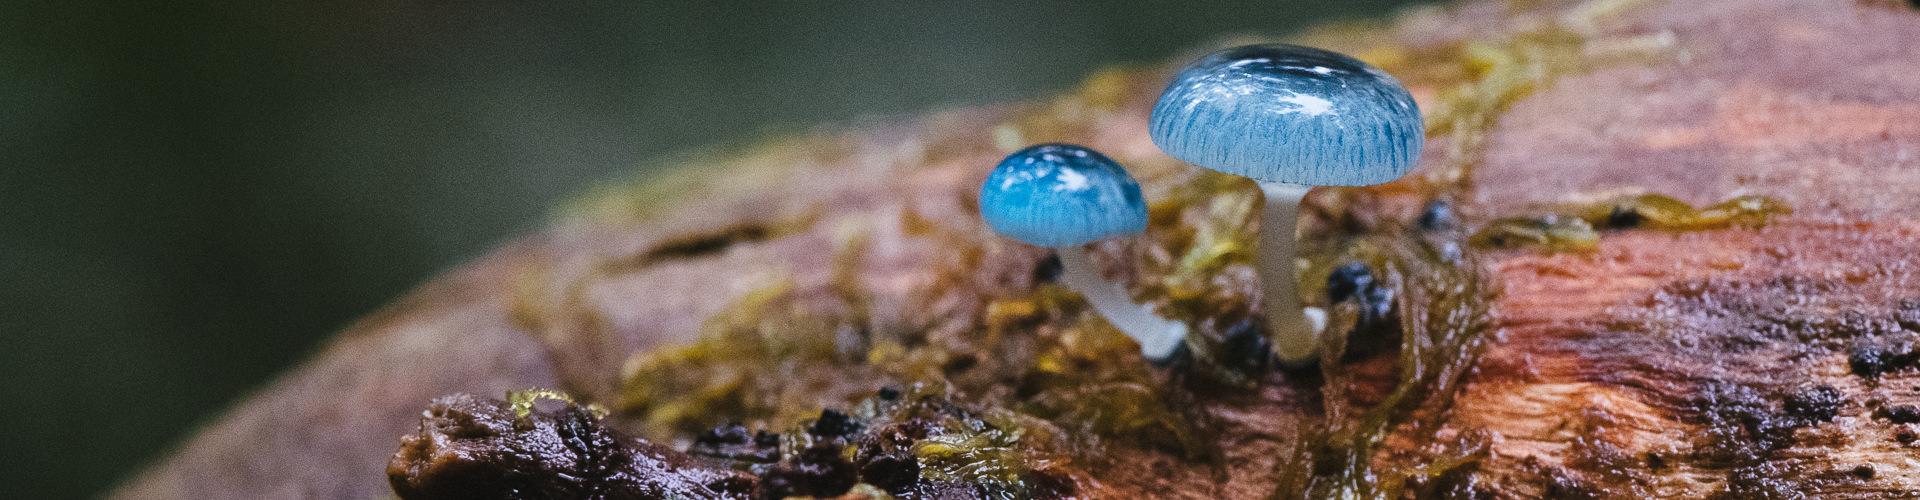 Mycena Interrupta forest fungi bushwalk Great Western Tiers